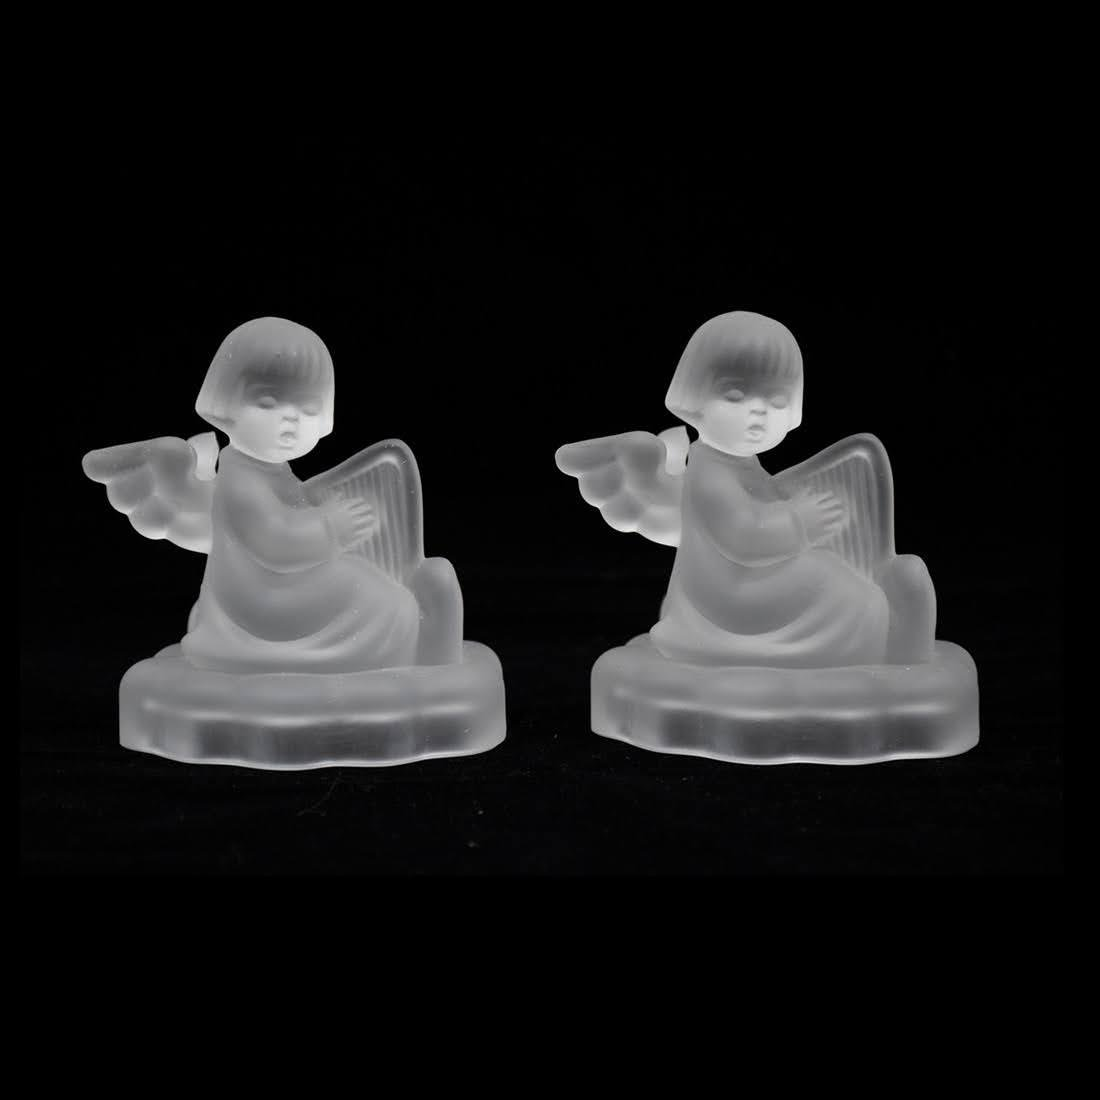 M.I. Hummel Avon Pair of Crystal Candlestick Holders